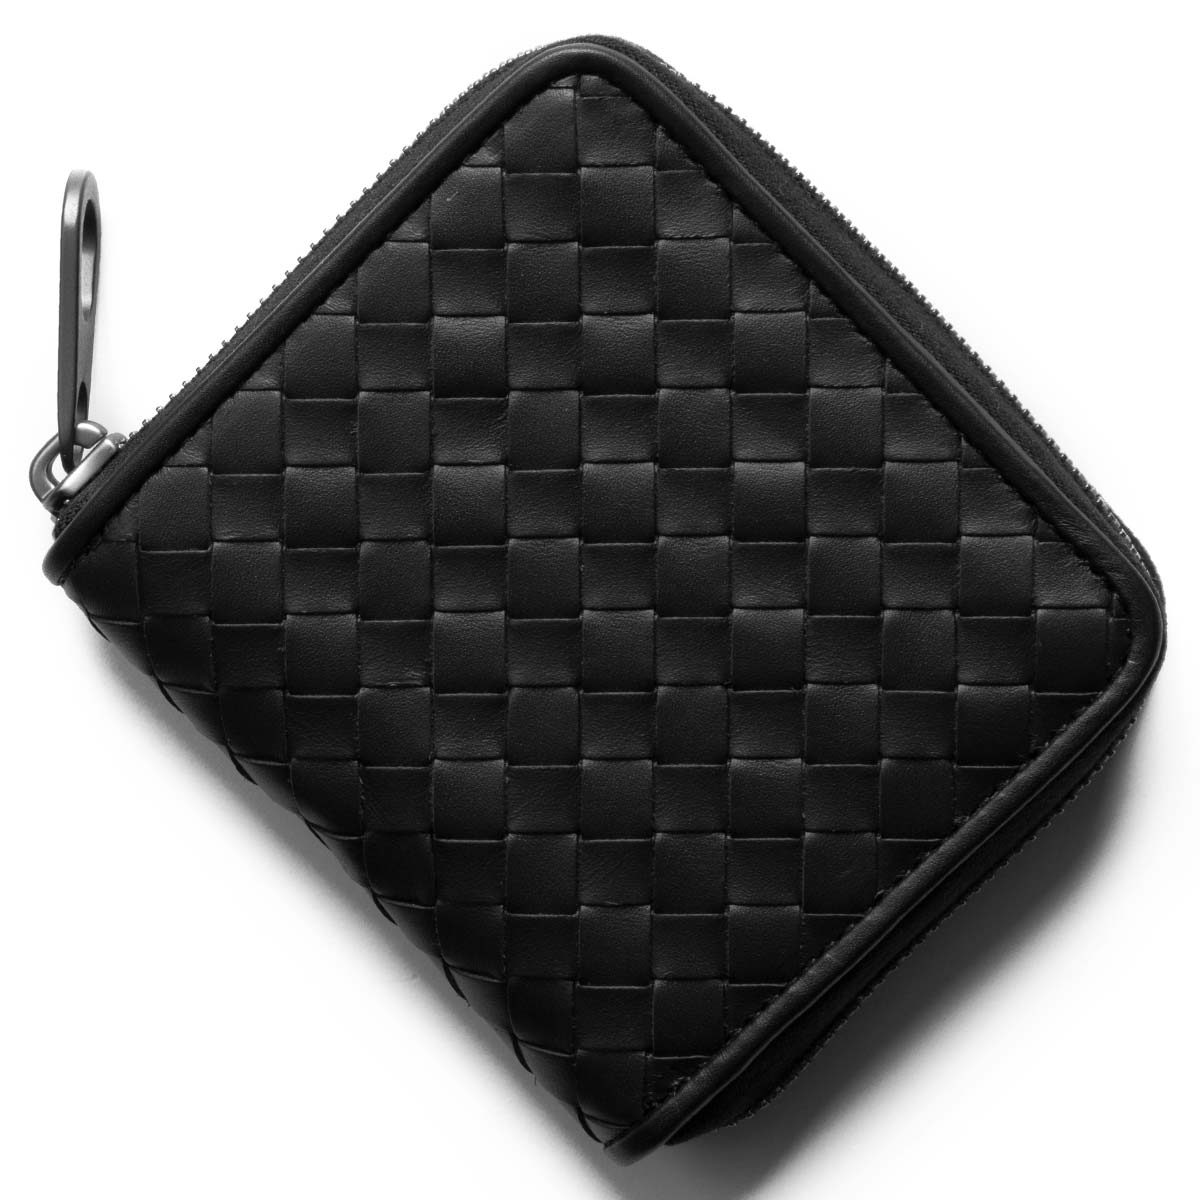 BottegaVeneta(ボッテガヴェネタ)『二つ折り財布』